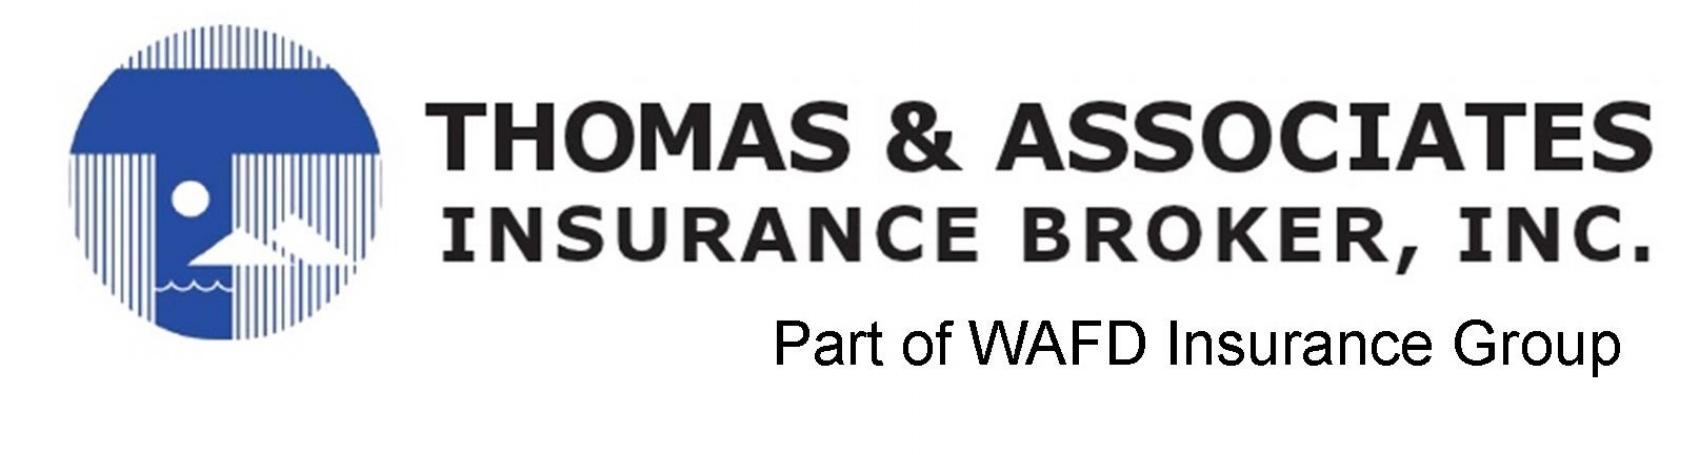 logo with WAFD (3).jpg